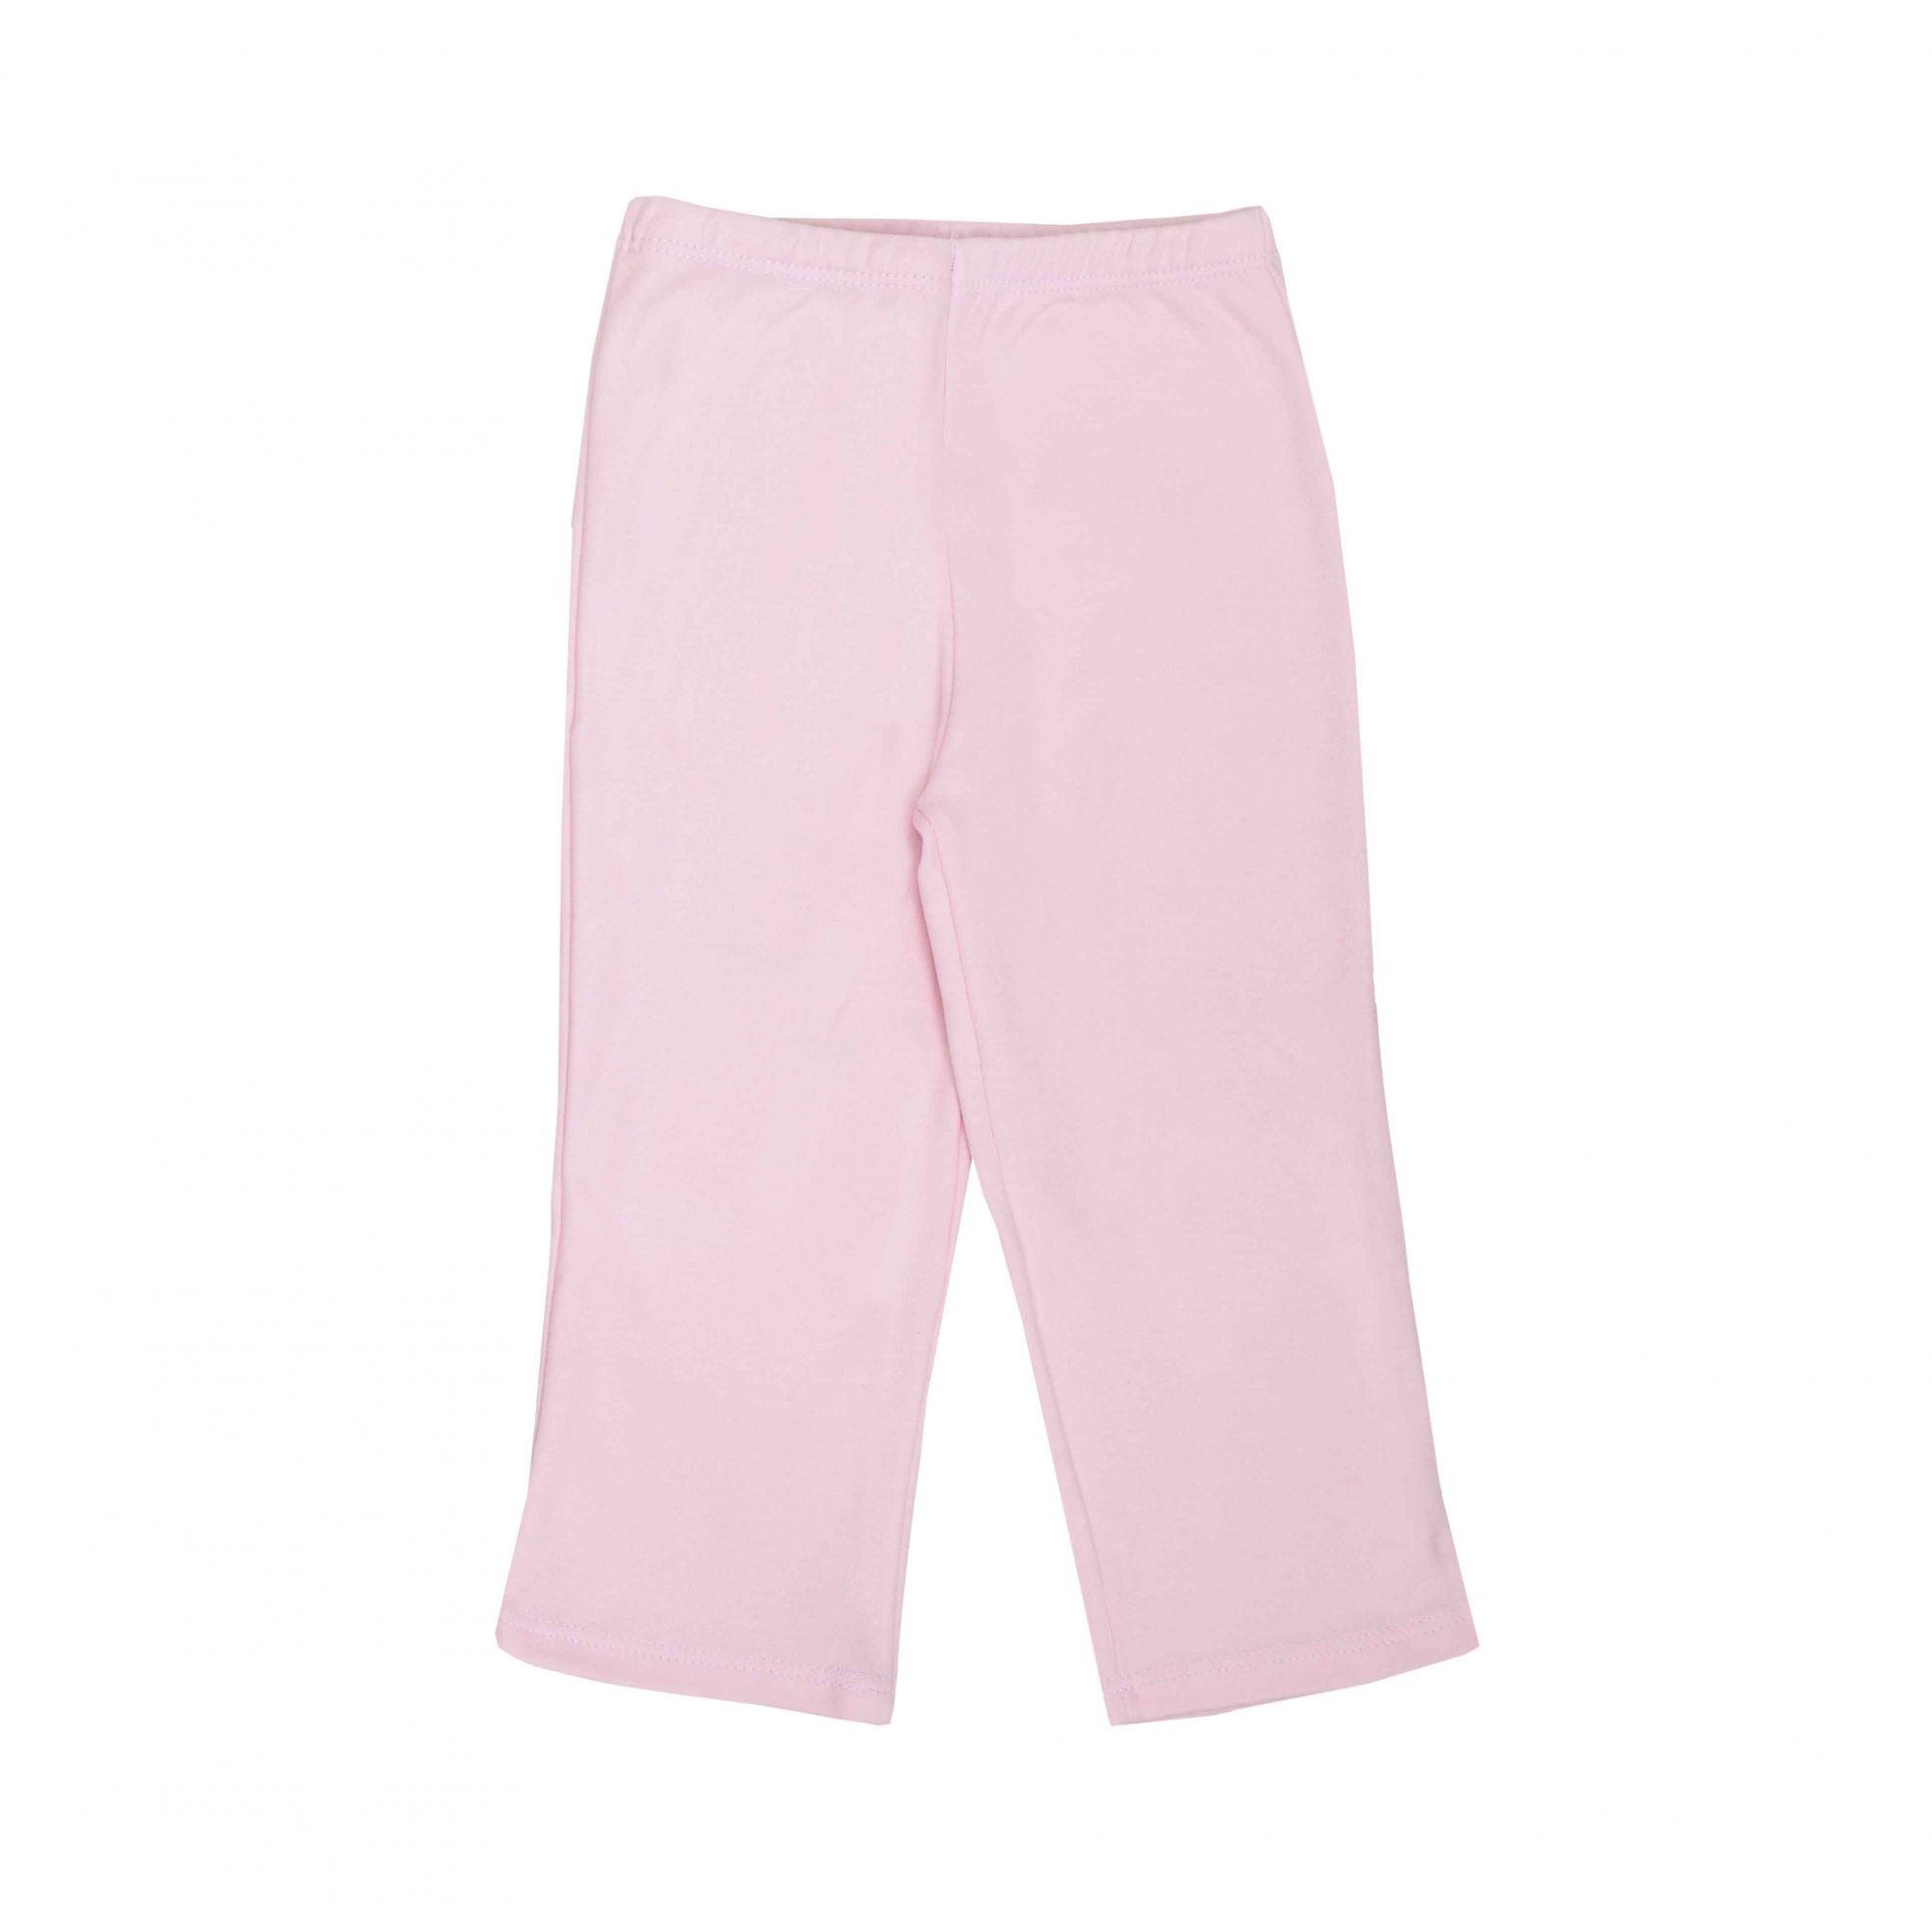 Kit Pijama Camiseta Manga Longa e Calça Rosa